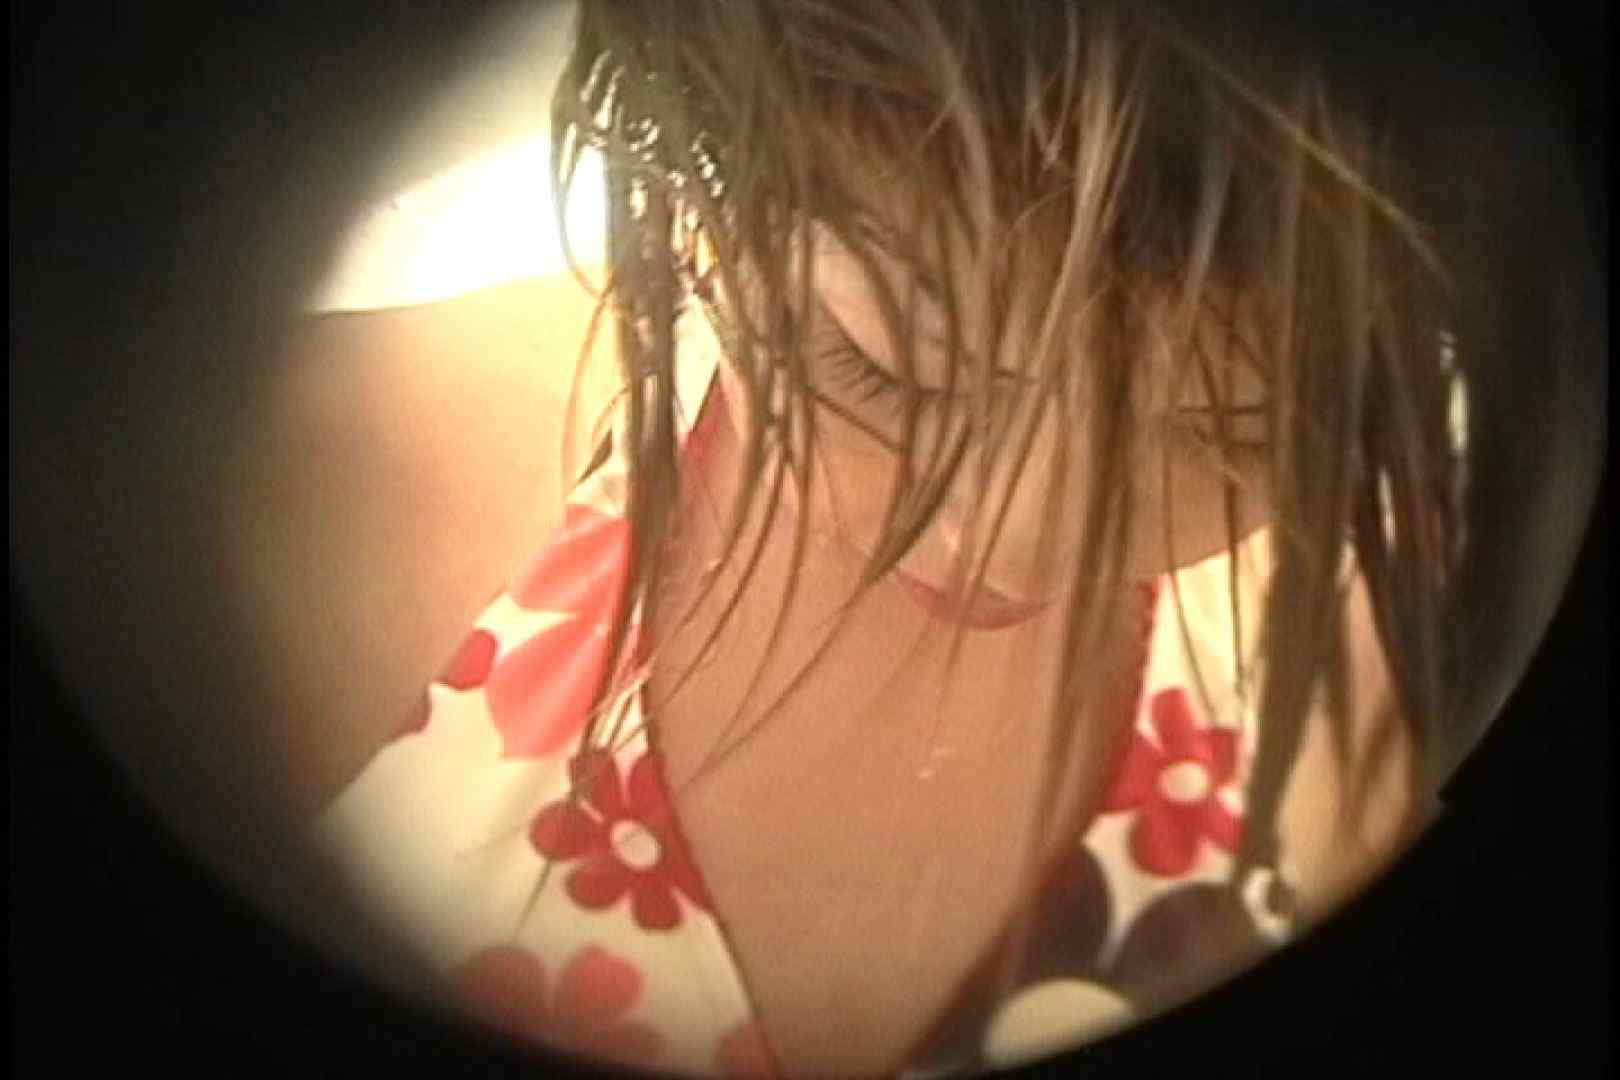 No.32 脇とVラインの処理が甘い貧乳ギャル、タンポンの紐がぶらぶら シャワー室 | 乙女H映像  88画像 28